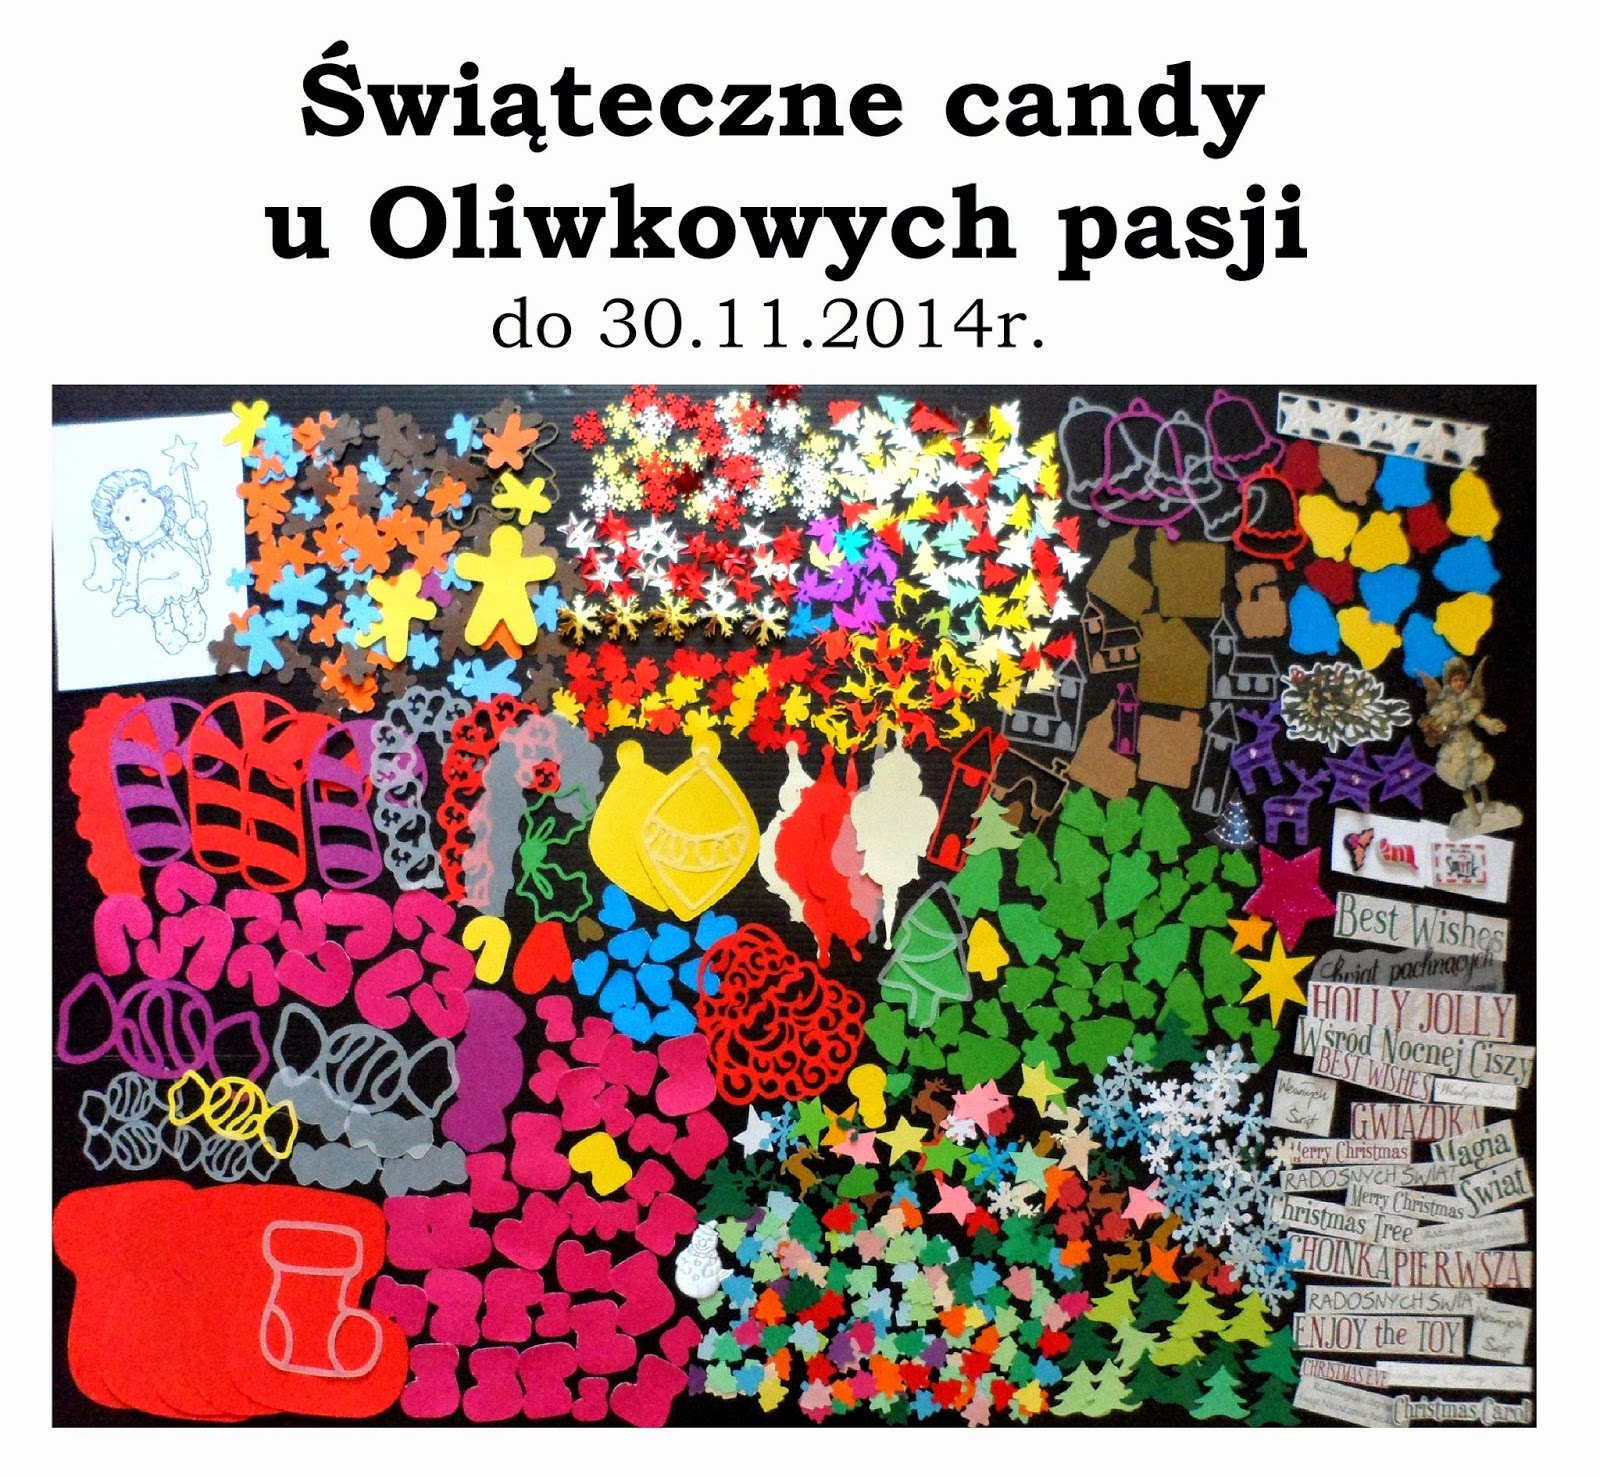 candy do 30 listopad